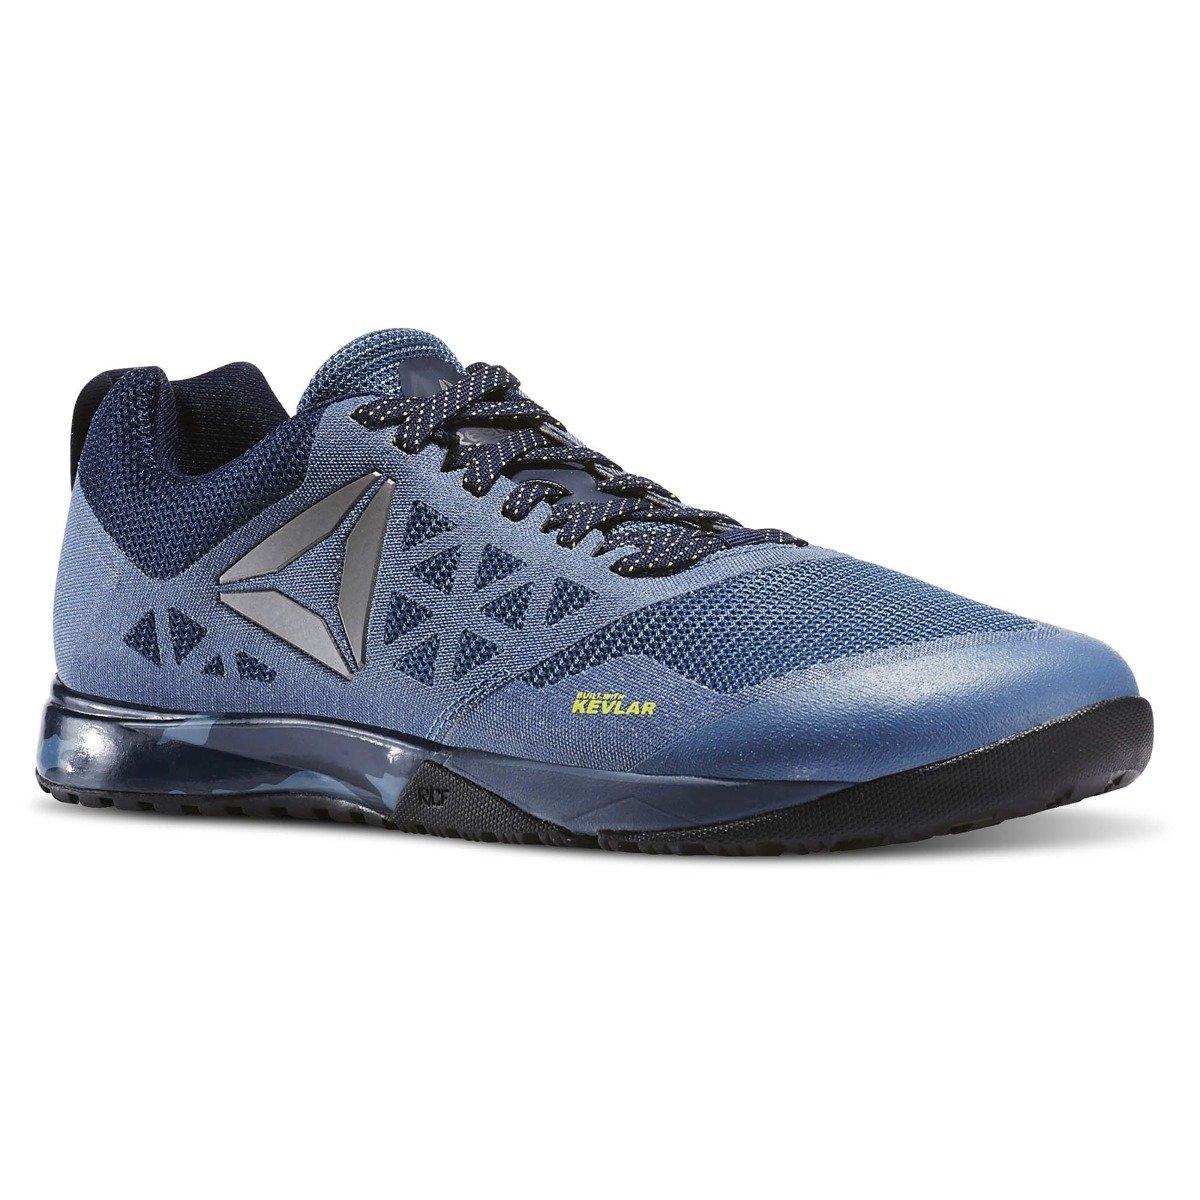 Reebok Crossfit Nano Shoes Uk